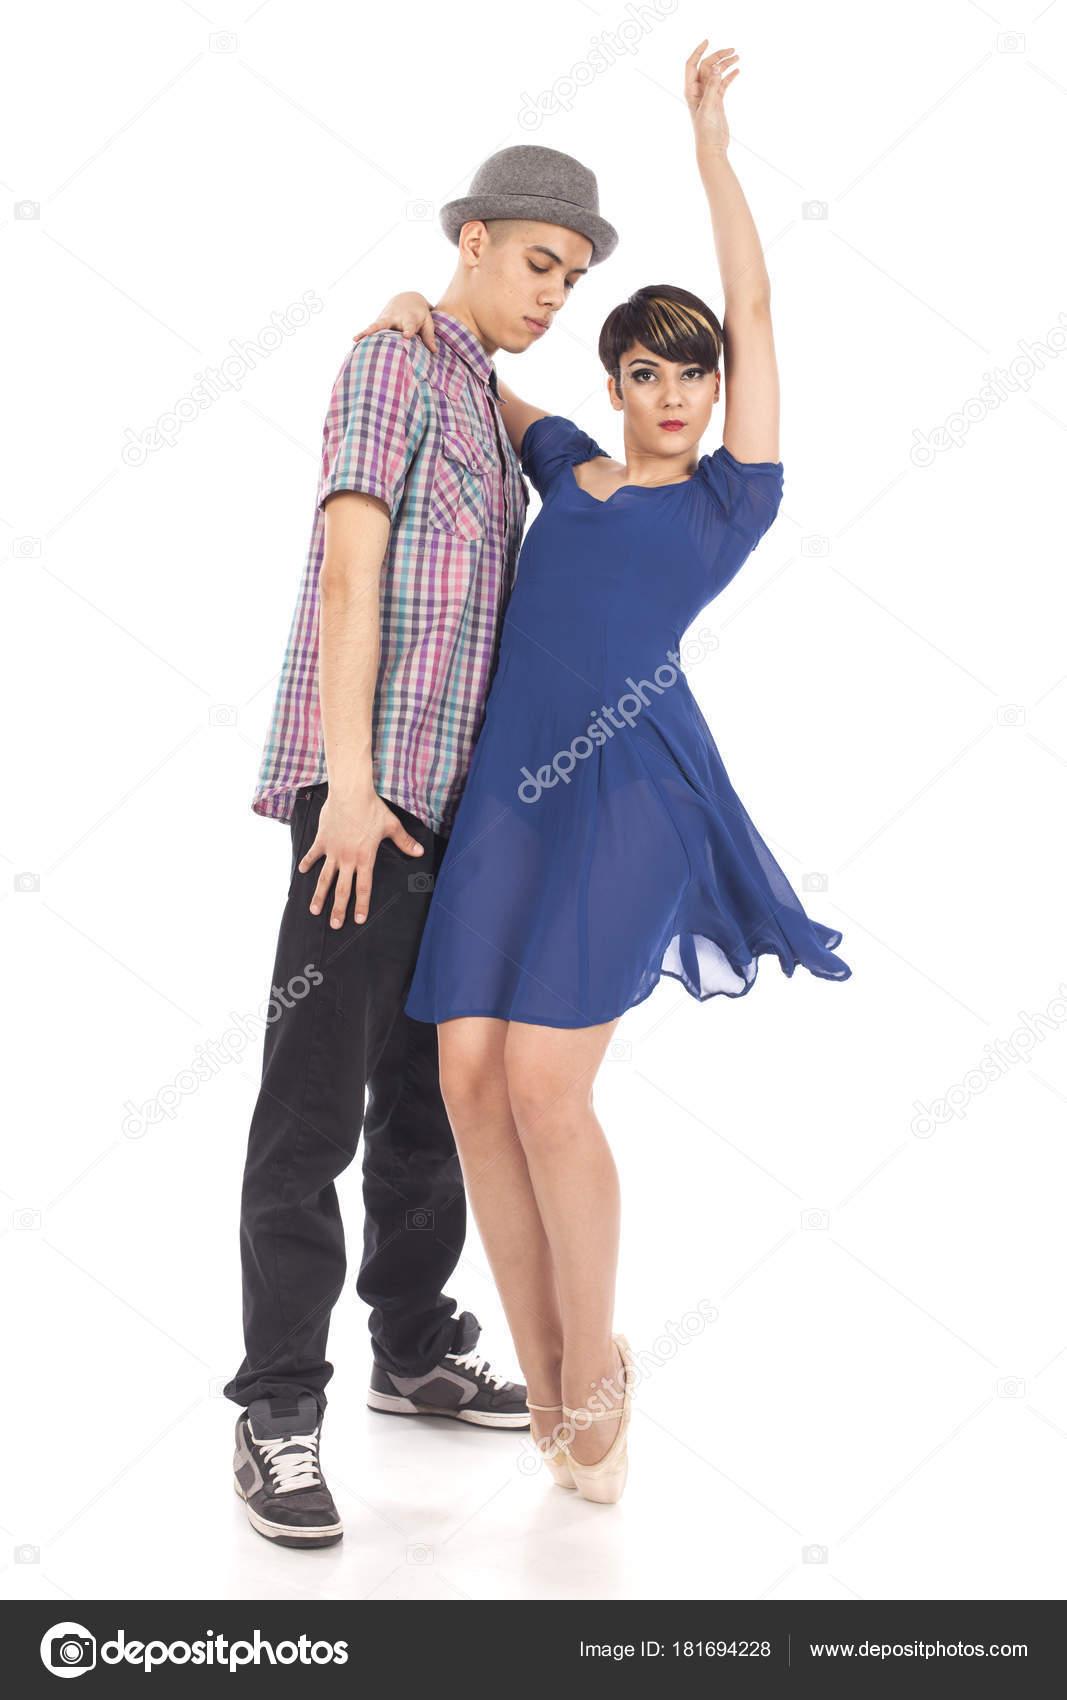 randki tancerza